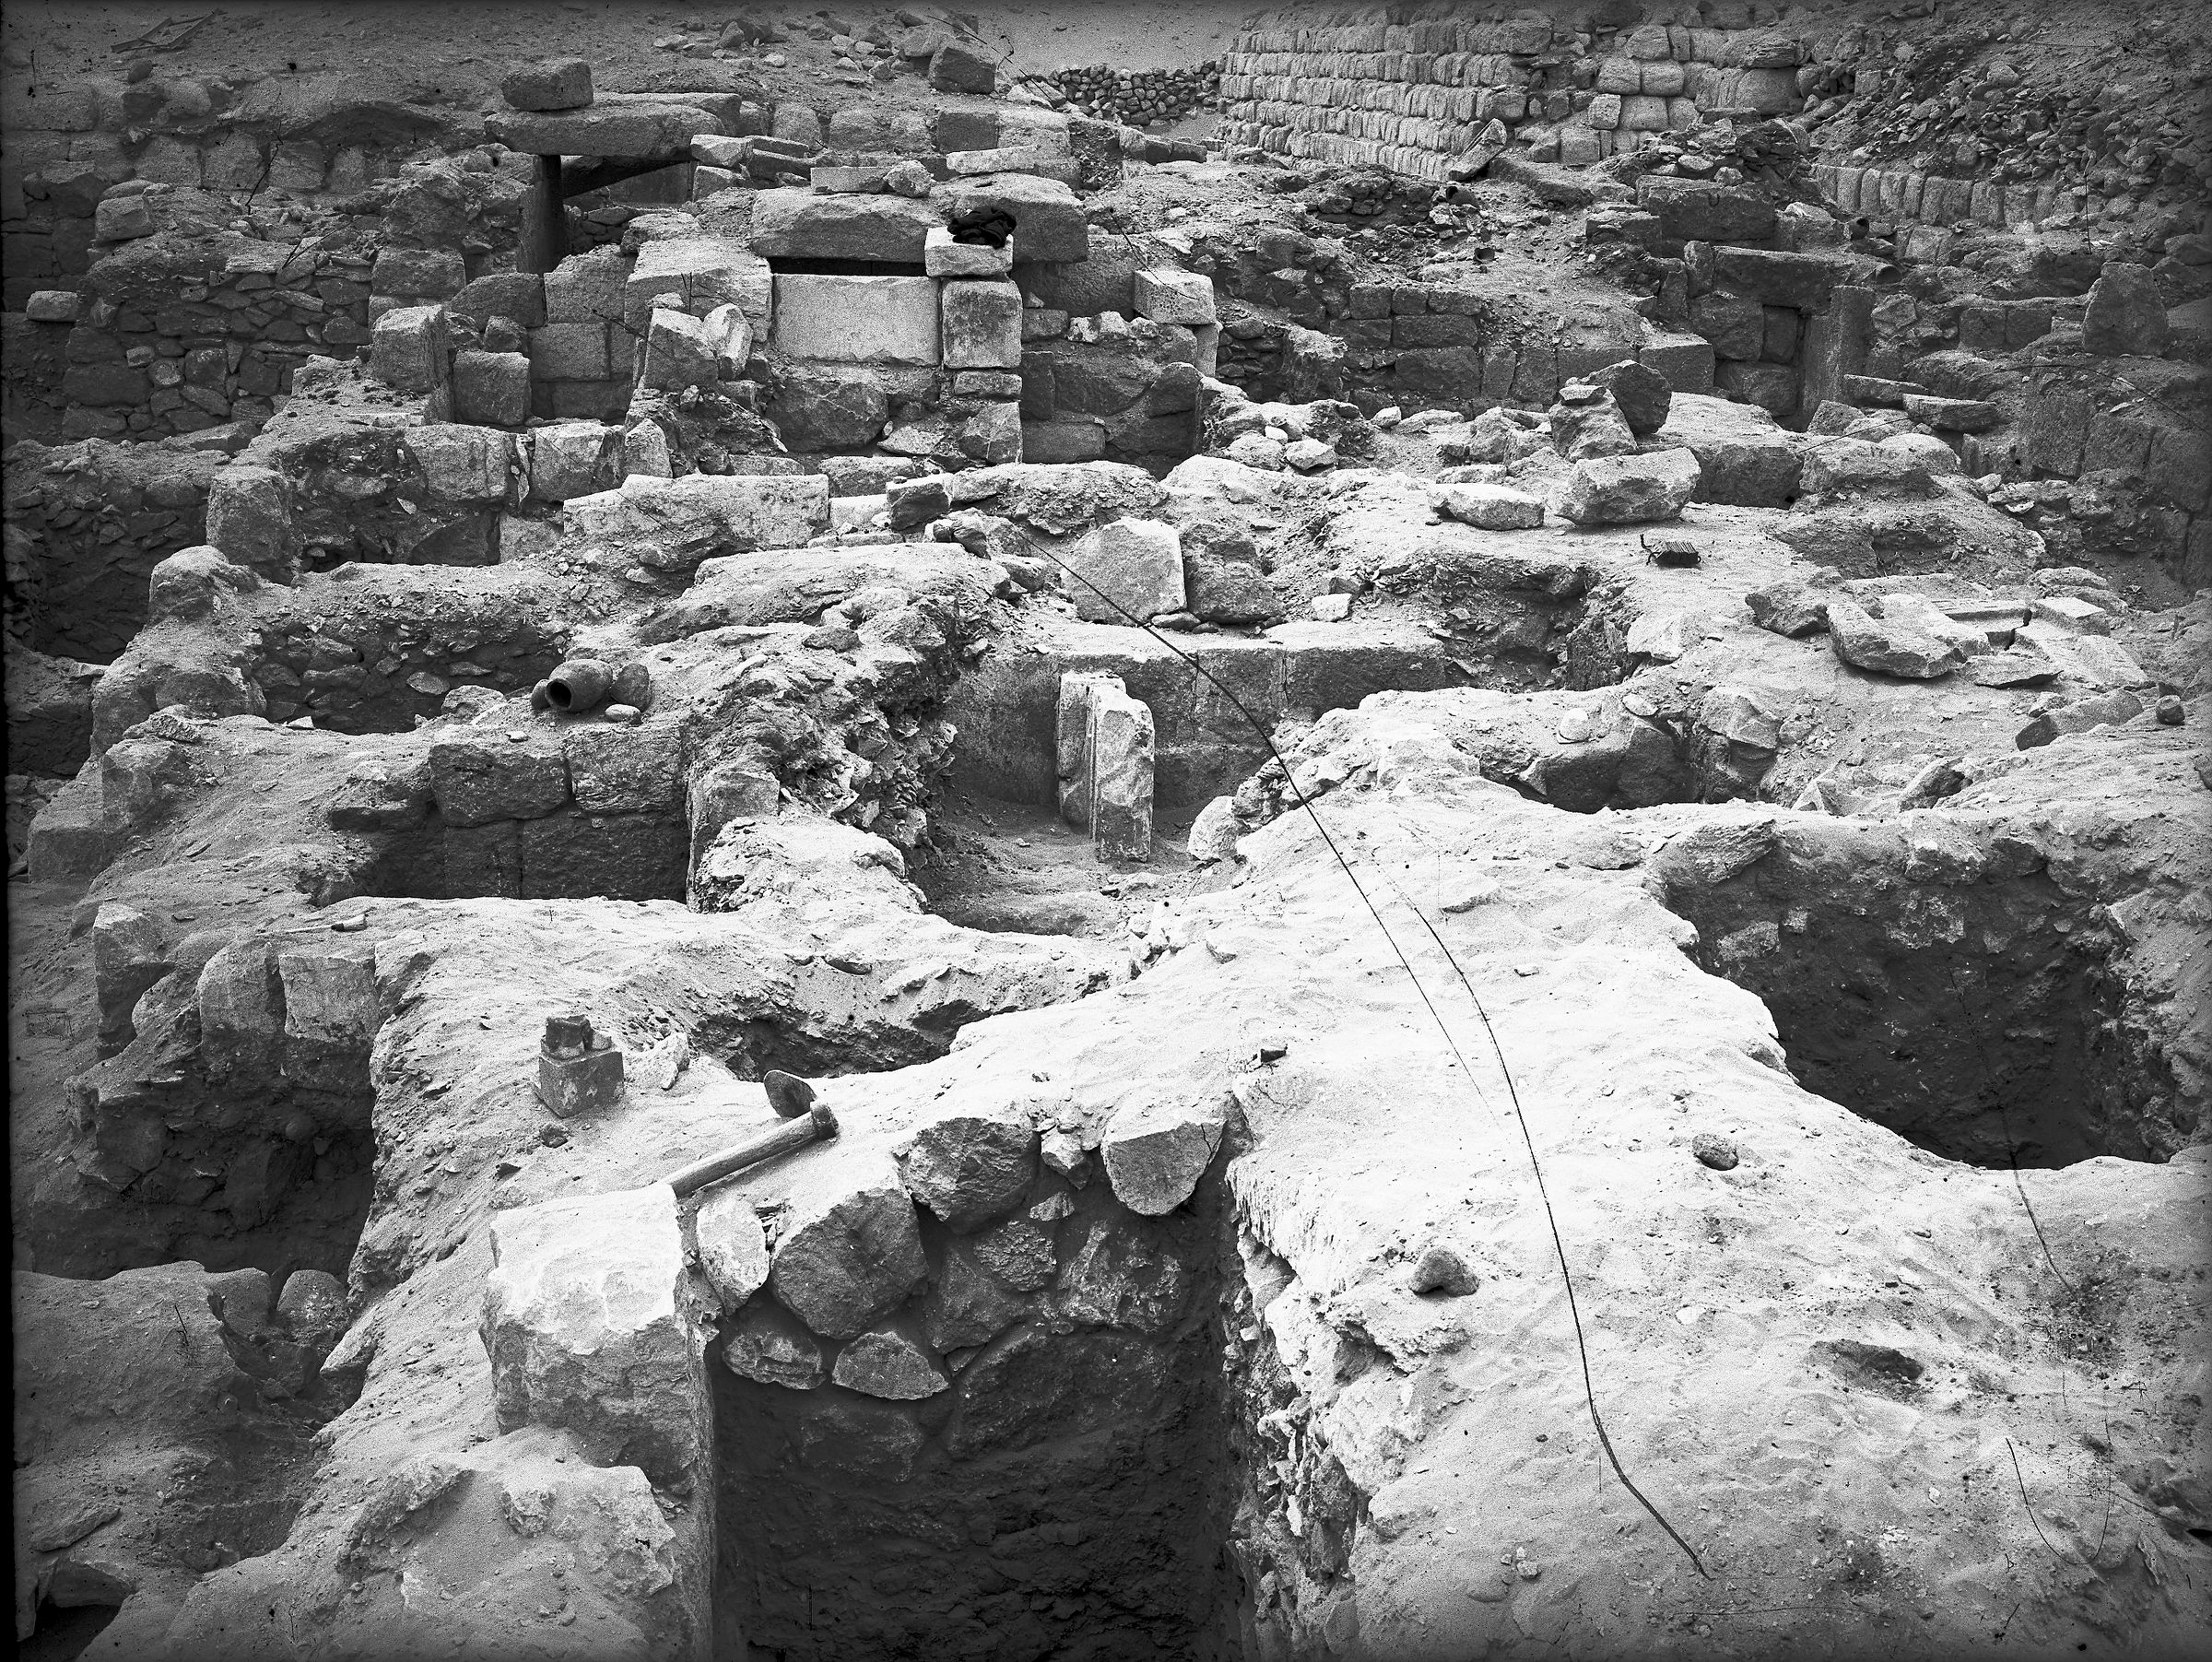 Western Cemetery: Site: Giza; View: G 2177, G 2175, G 2170, G 2231 X